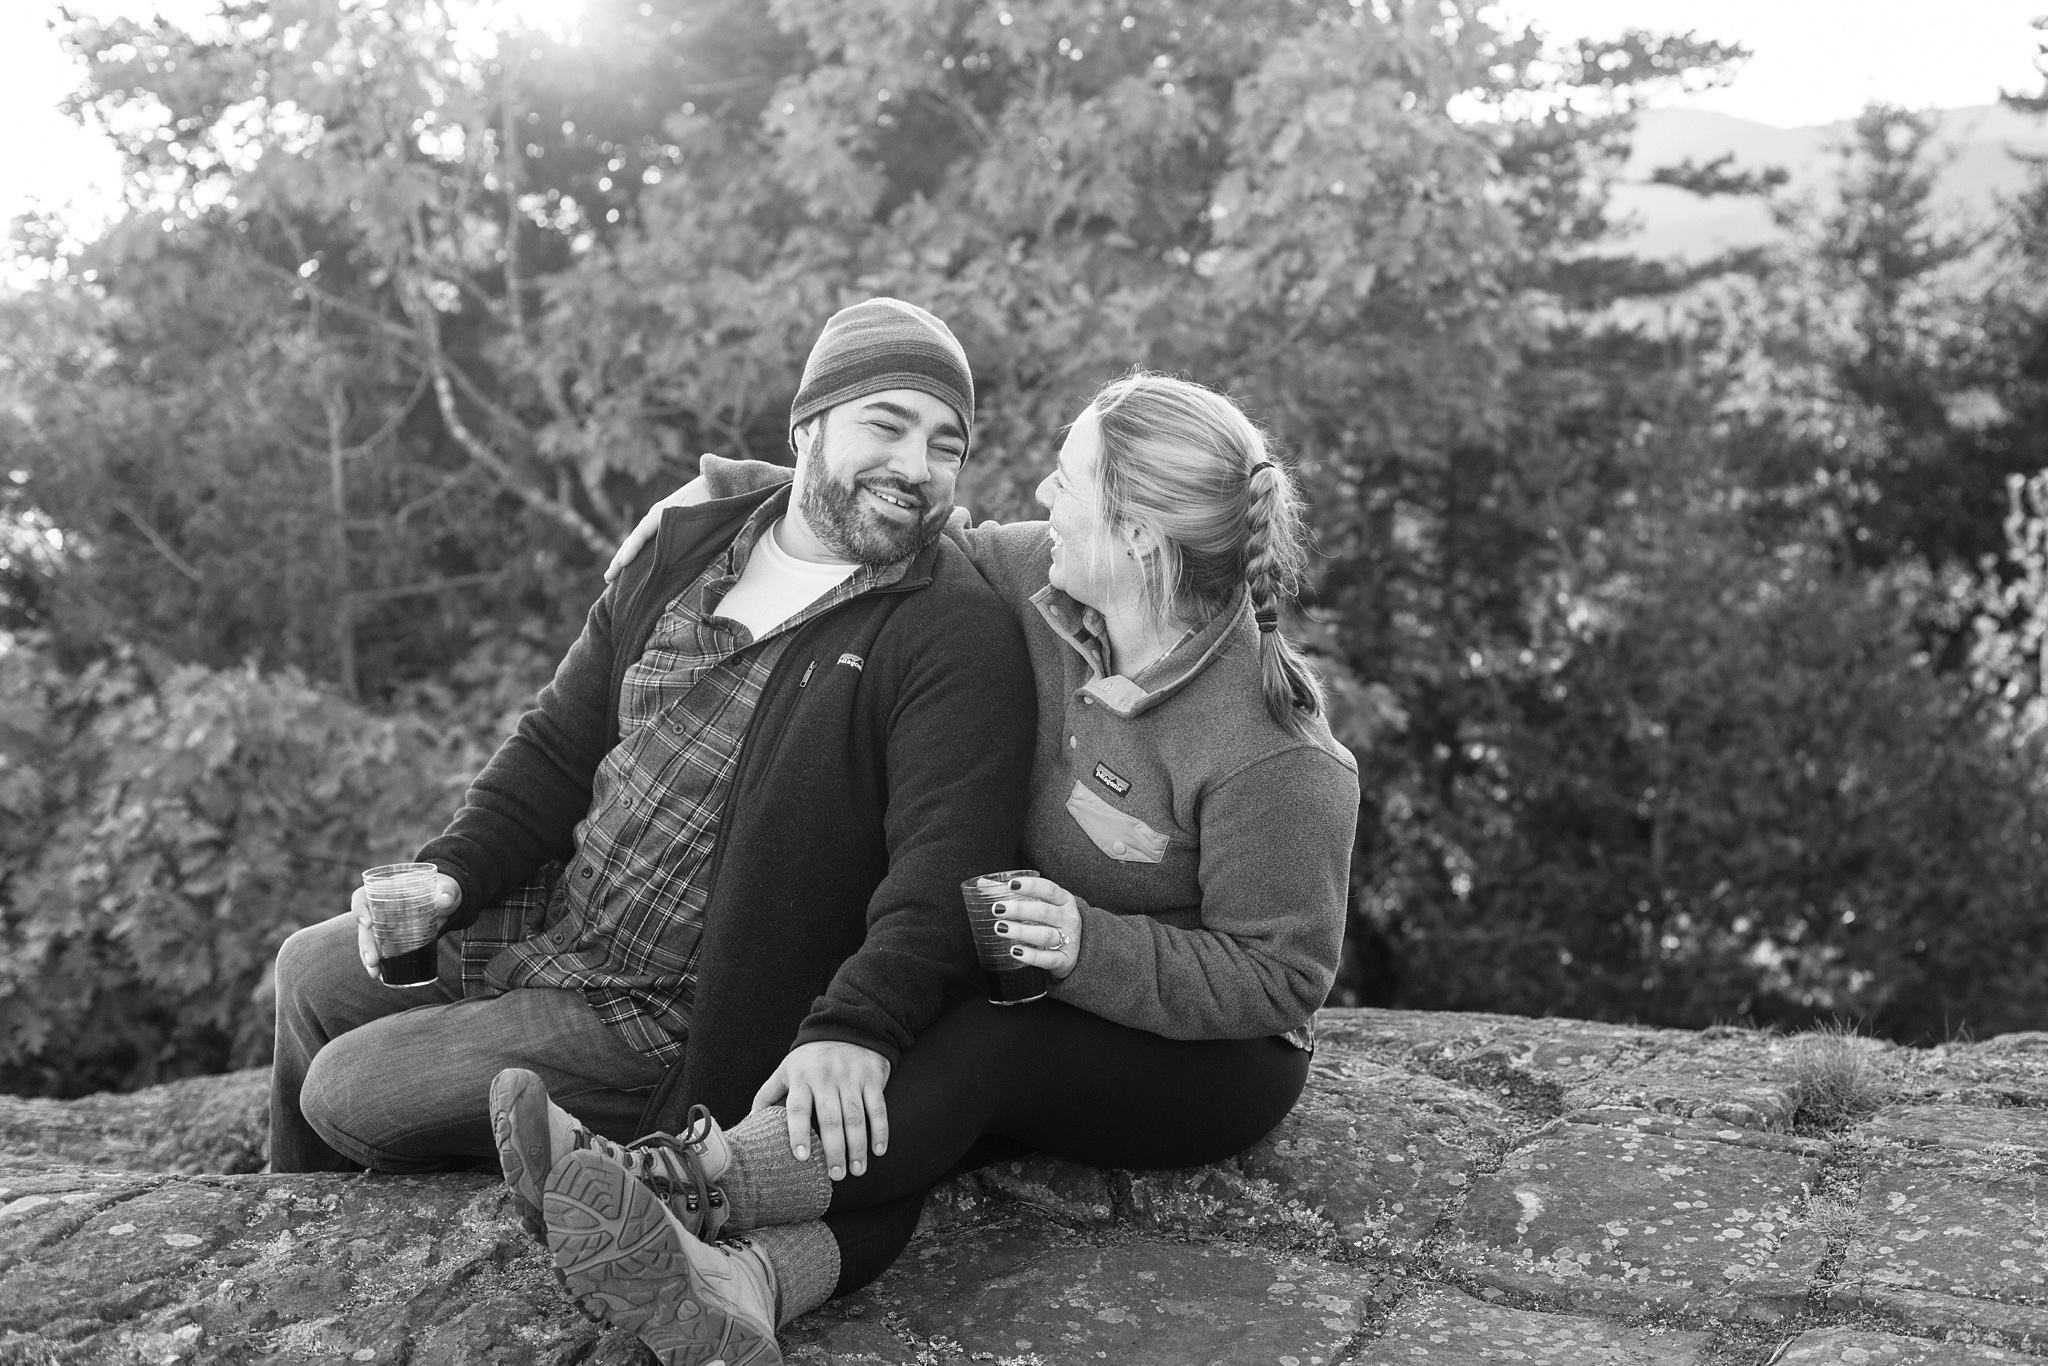 proposal during hike